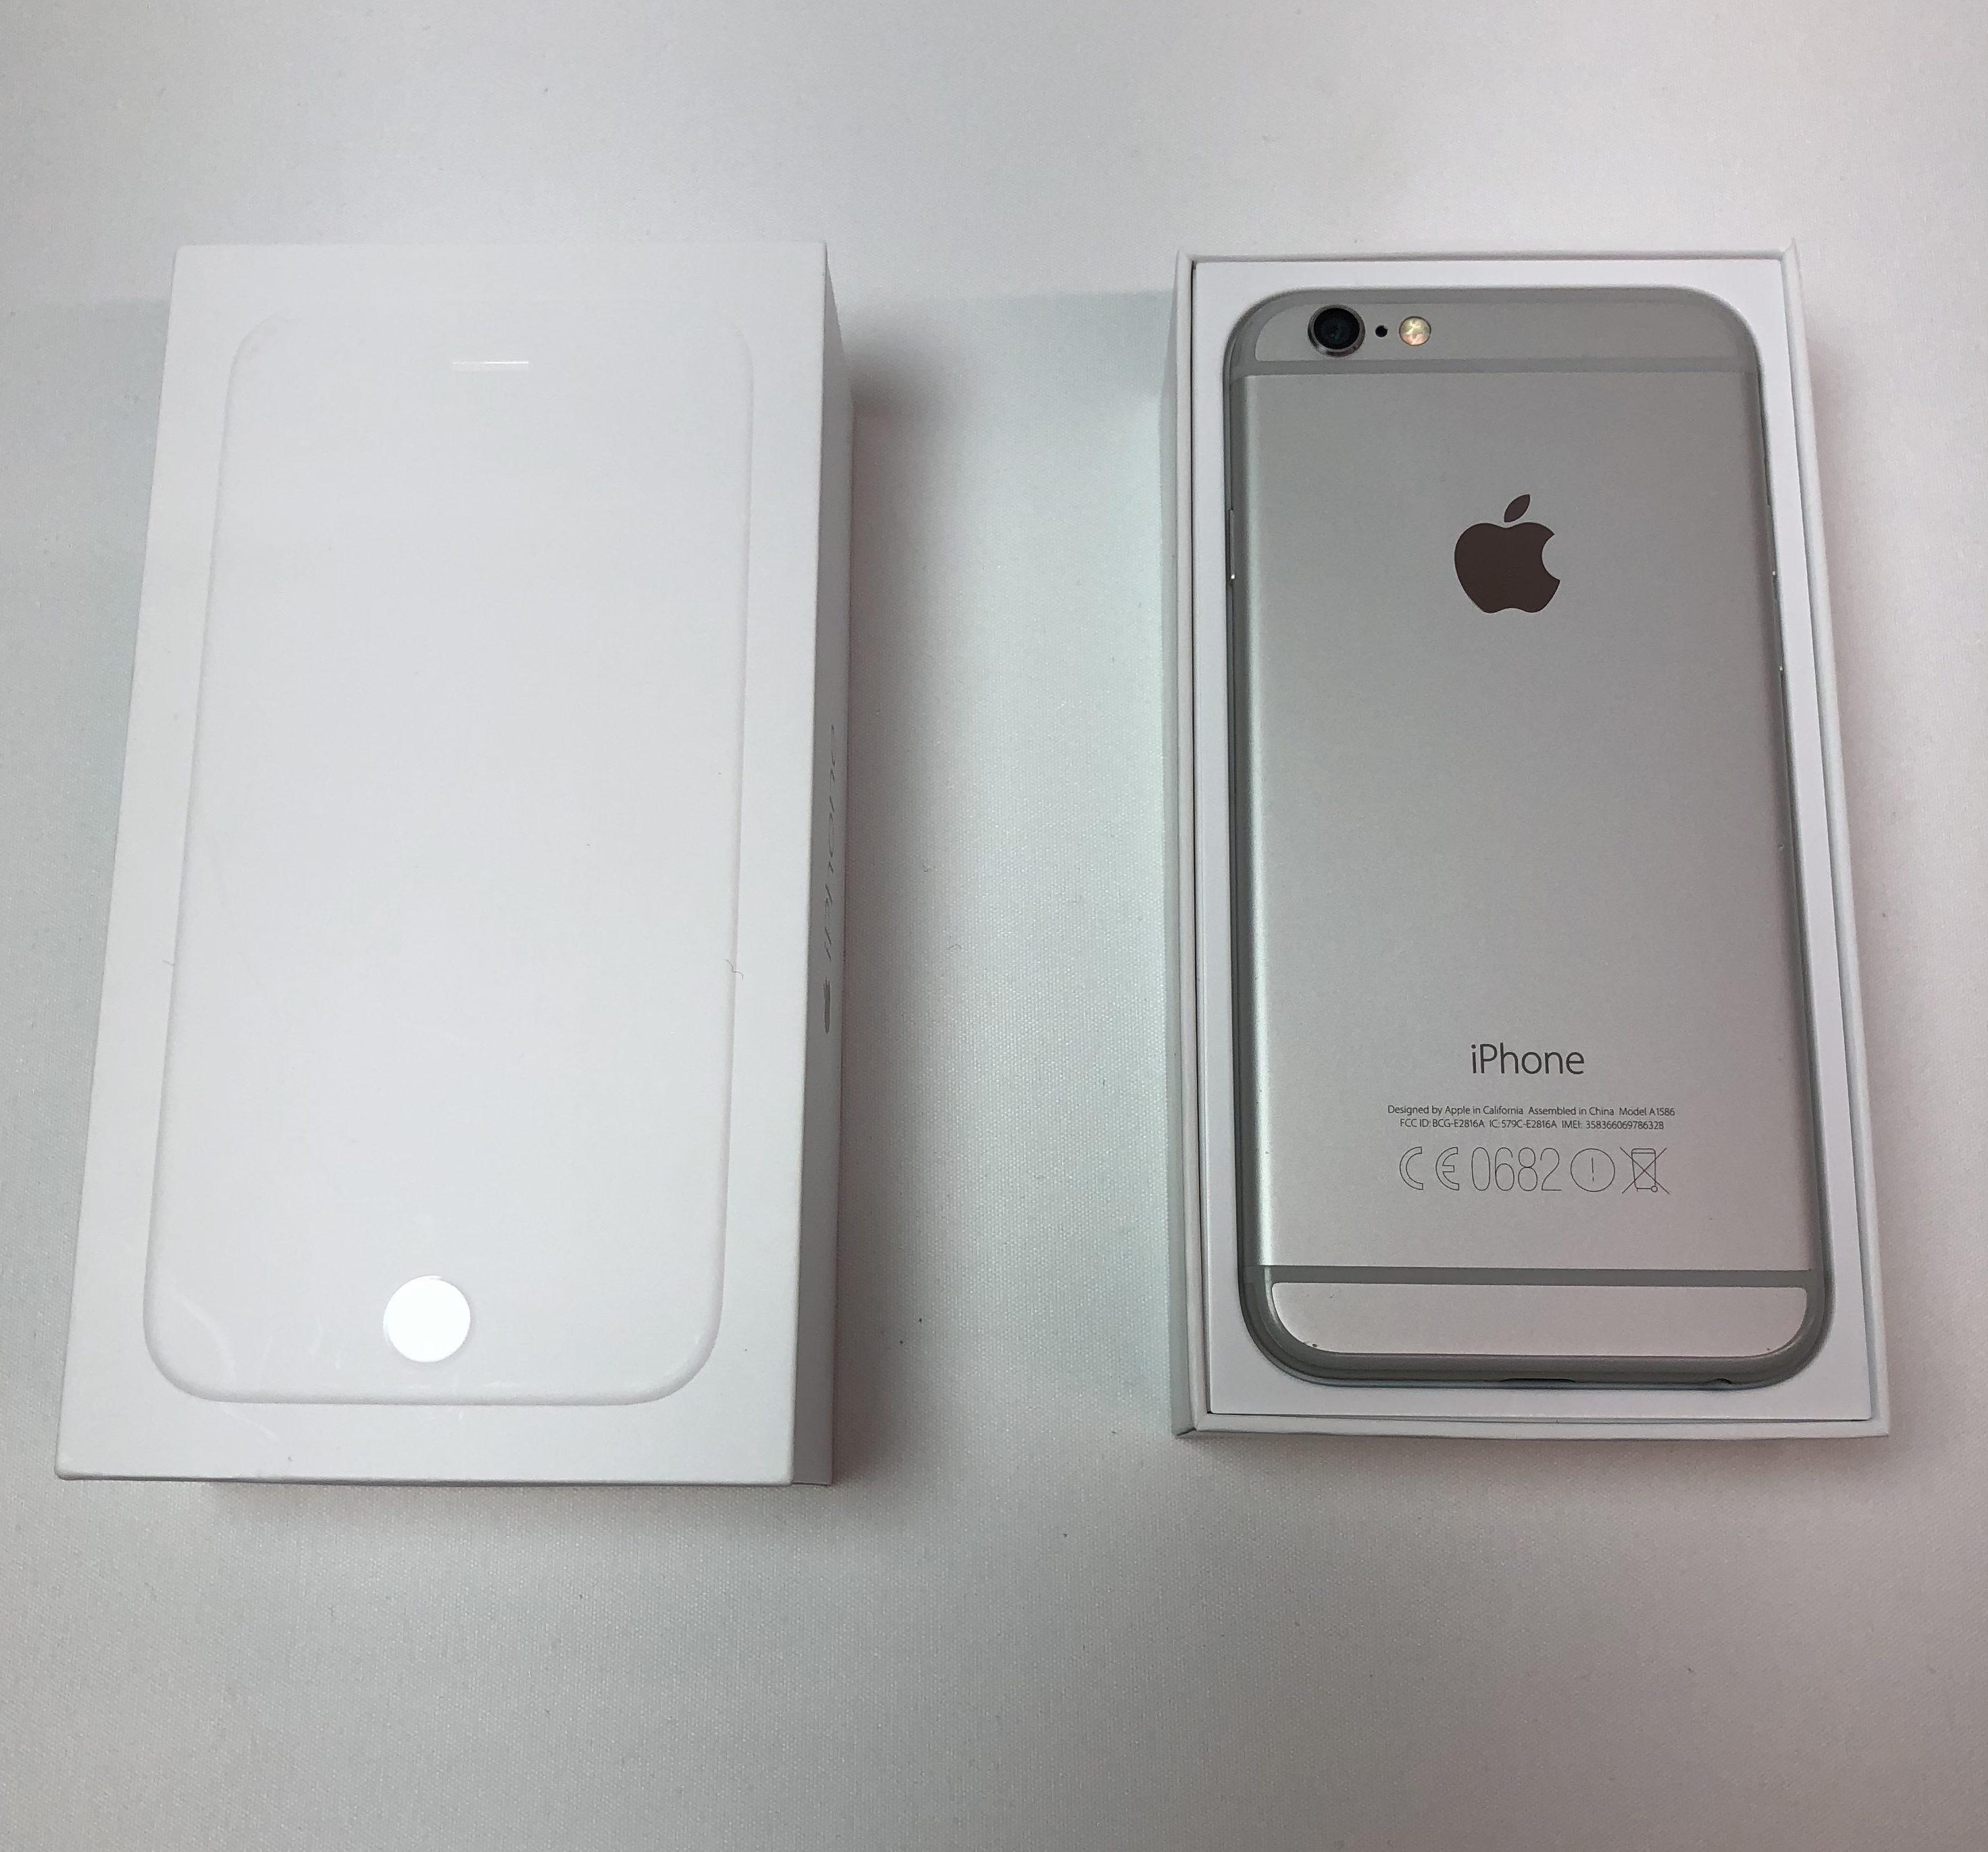 iPhone 6 16GB, 16 GB, Silver, Kuva 4